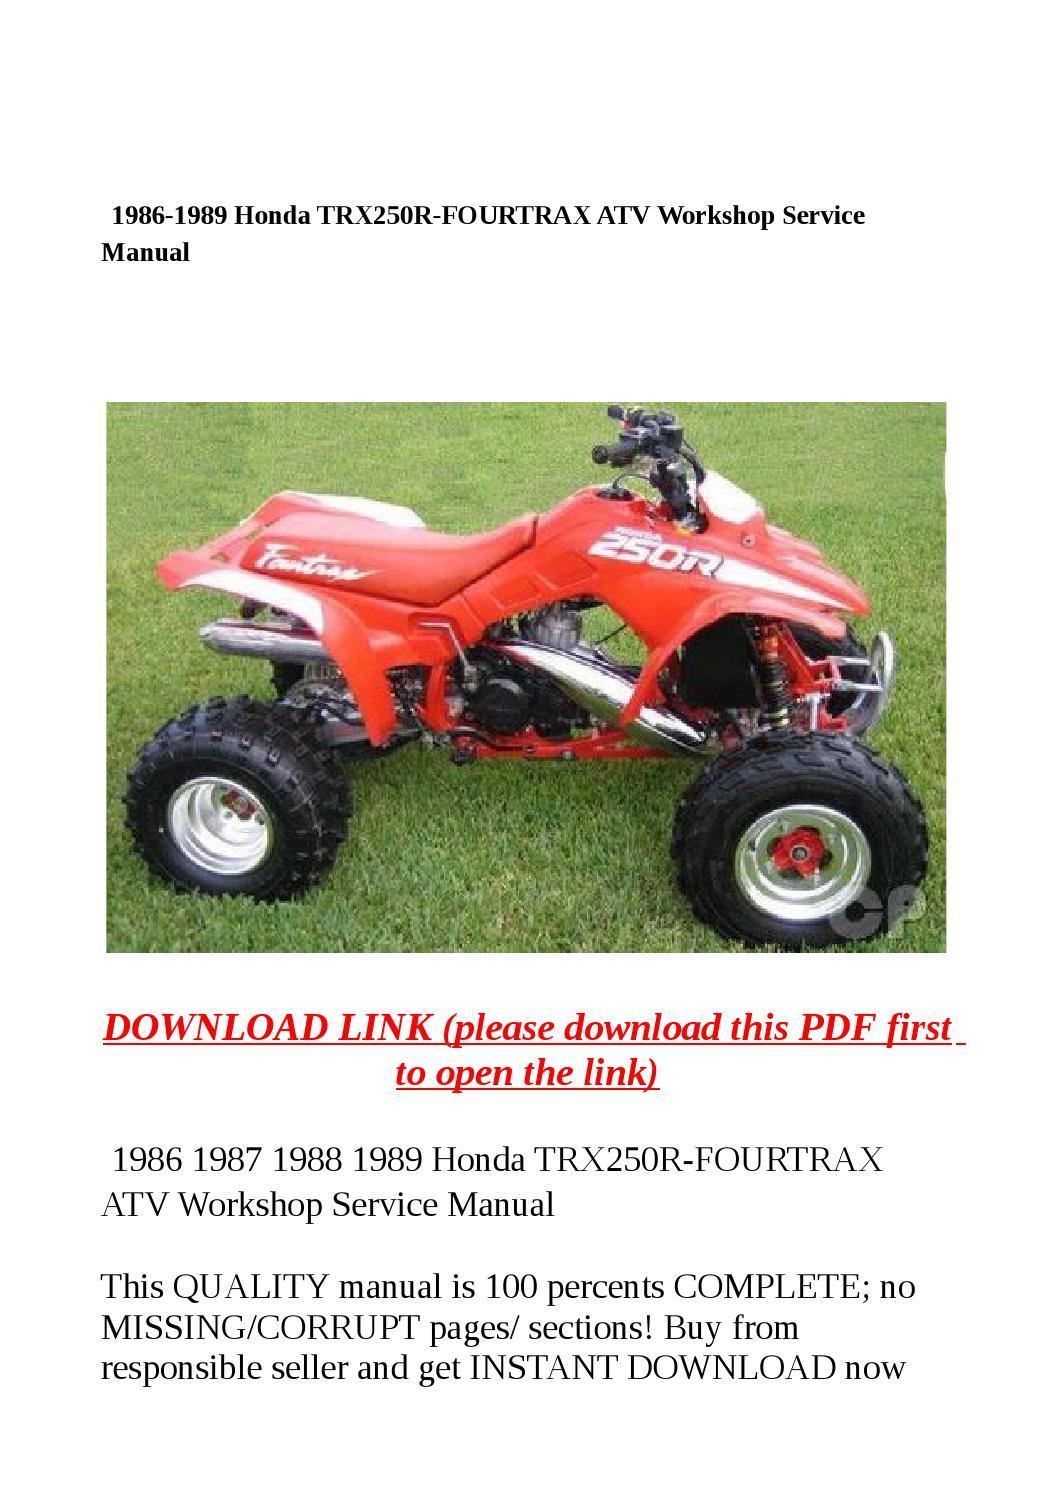 1986 honda trx250 fourtrax manual